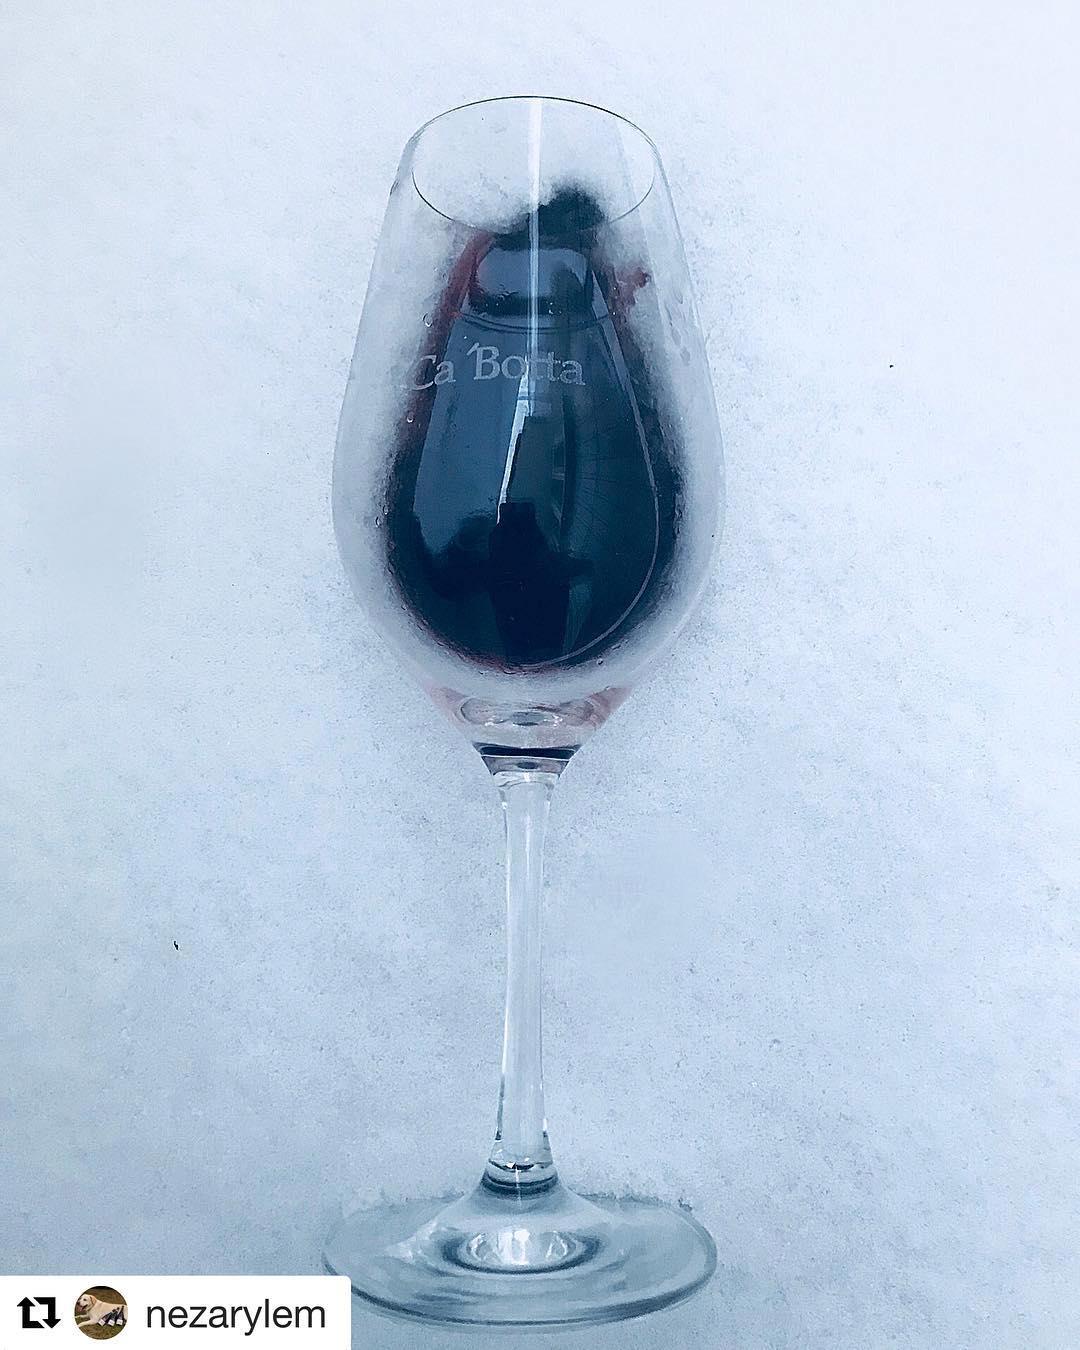 Amarone is a great idea during the cold season @nezarylem with @get_repost ??? По настоящему зимнее – #Амароне  А что вы любите из Ca'Botta?#amarone#cabotta#зима#греемся